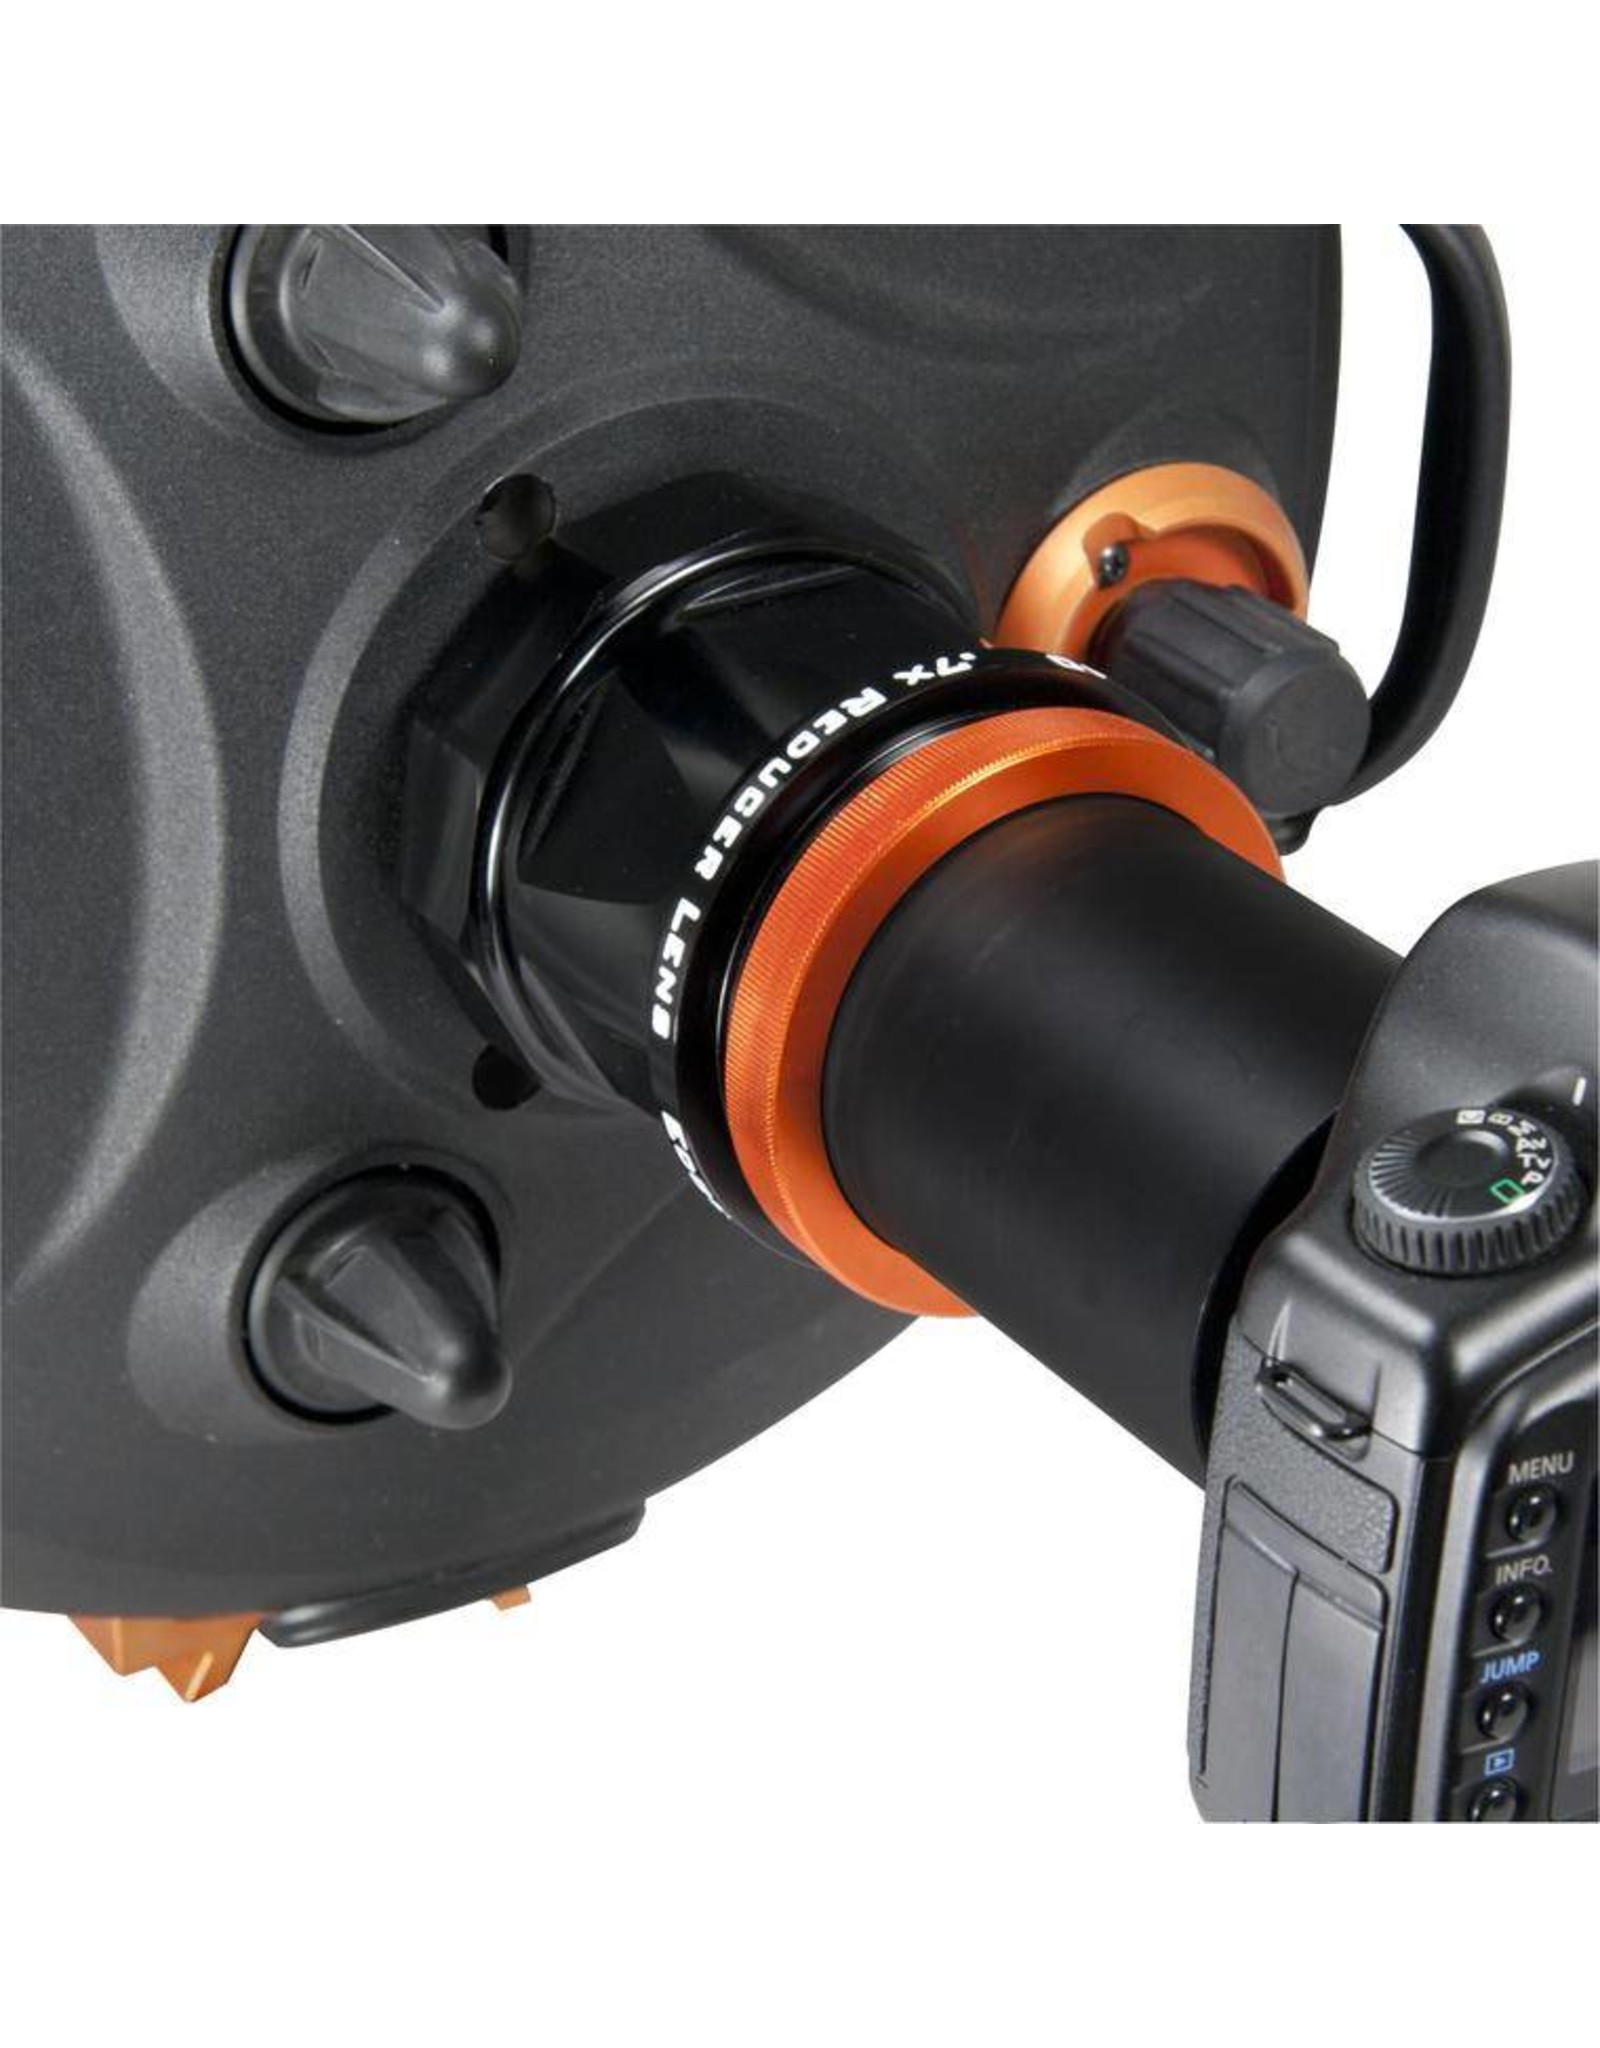 Celestron Celestron Reducer Lens .7x - EdgeHD 925